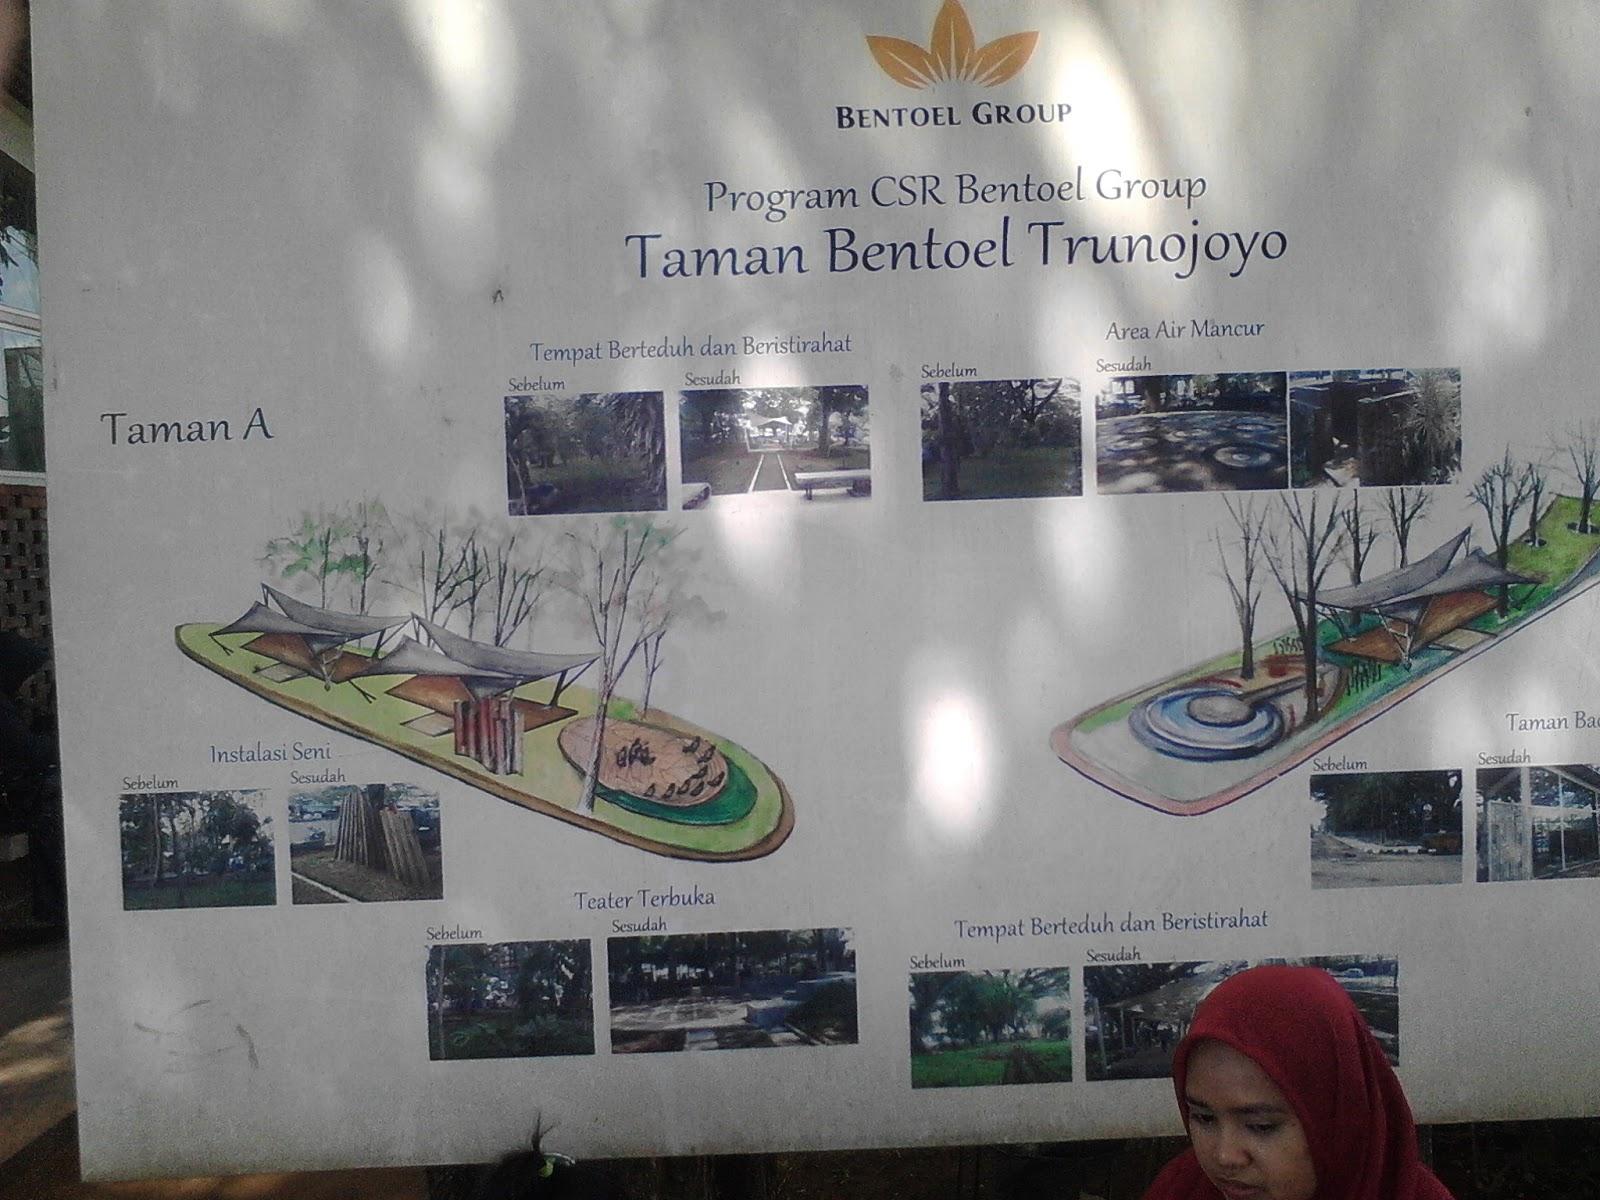 Jalan Taman Bentoel Trunojoyo Skemanya Cerdas Kota Malang